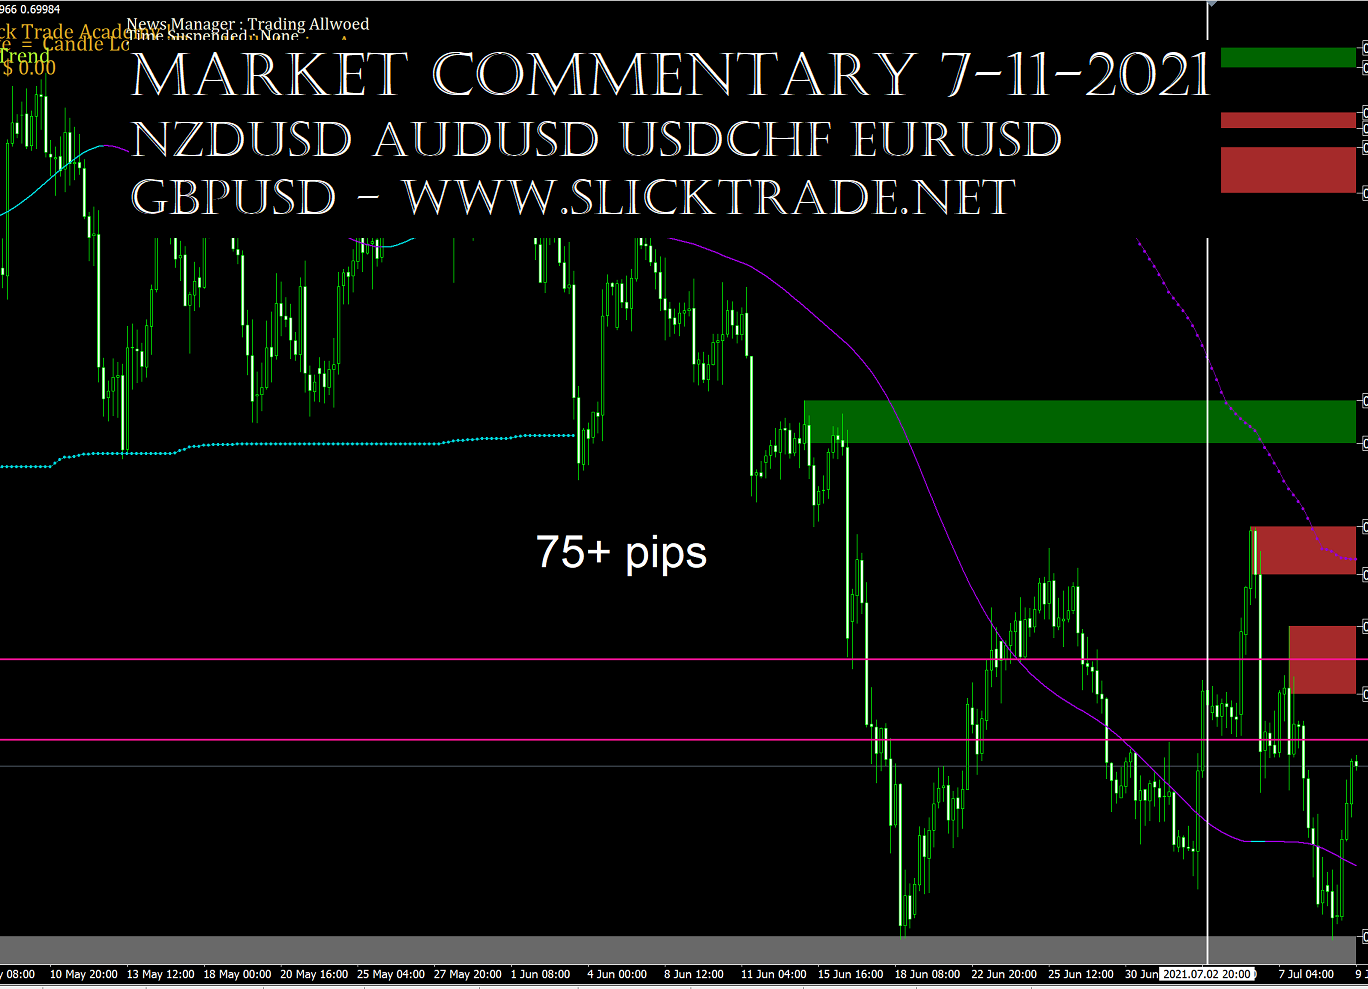 Market Commentary 7-11-2021 - NZDUSD AUDUSD USDCHF EURUSD GBPUSD